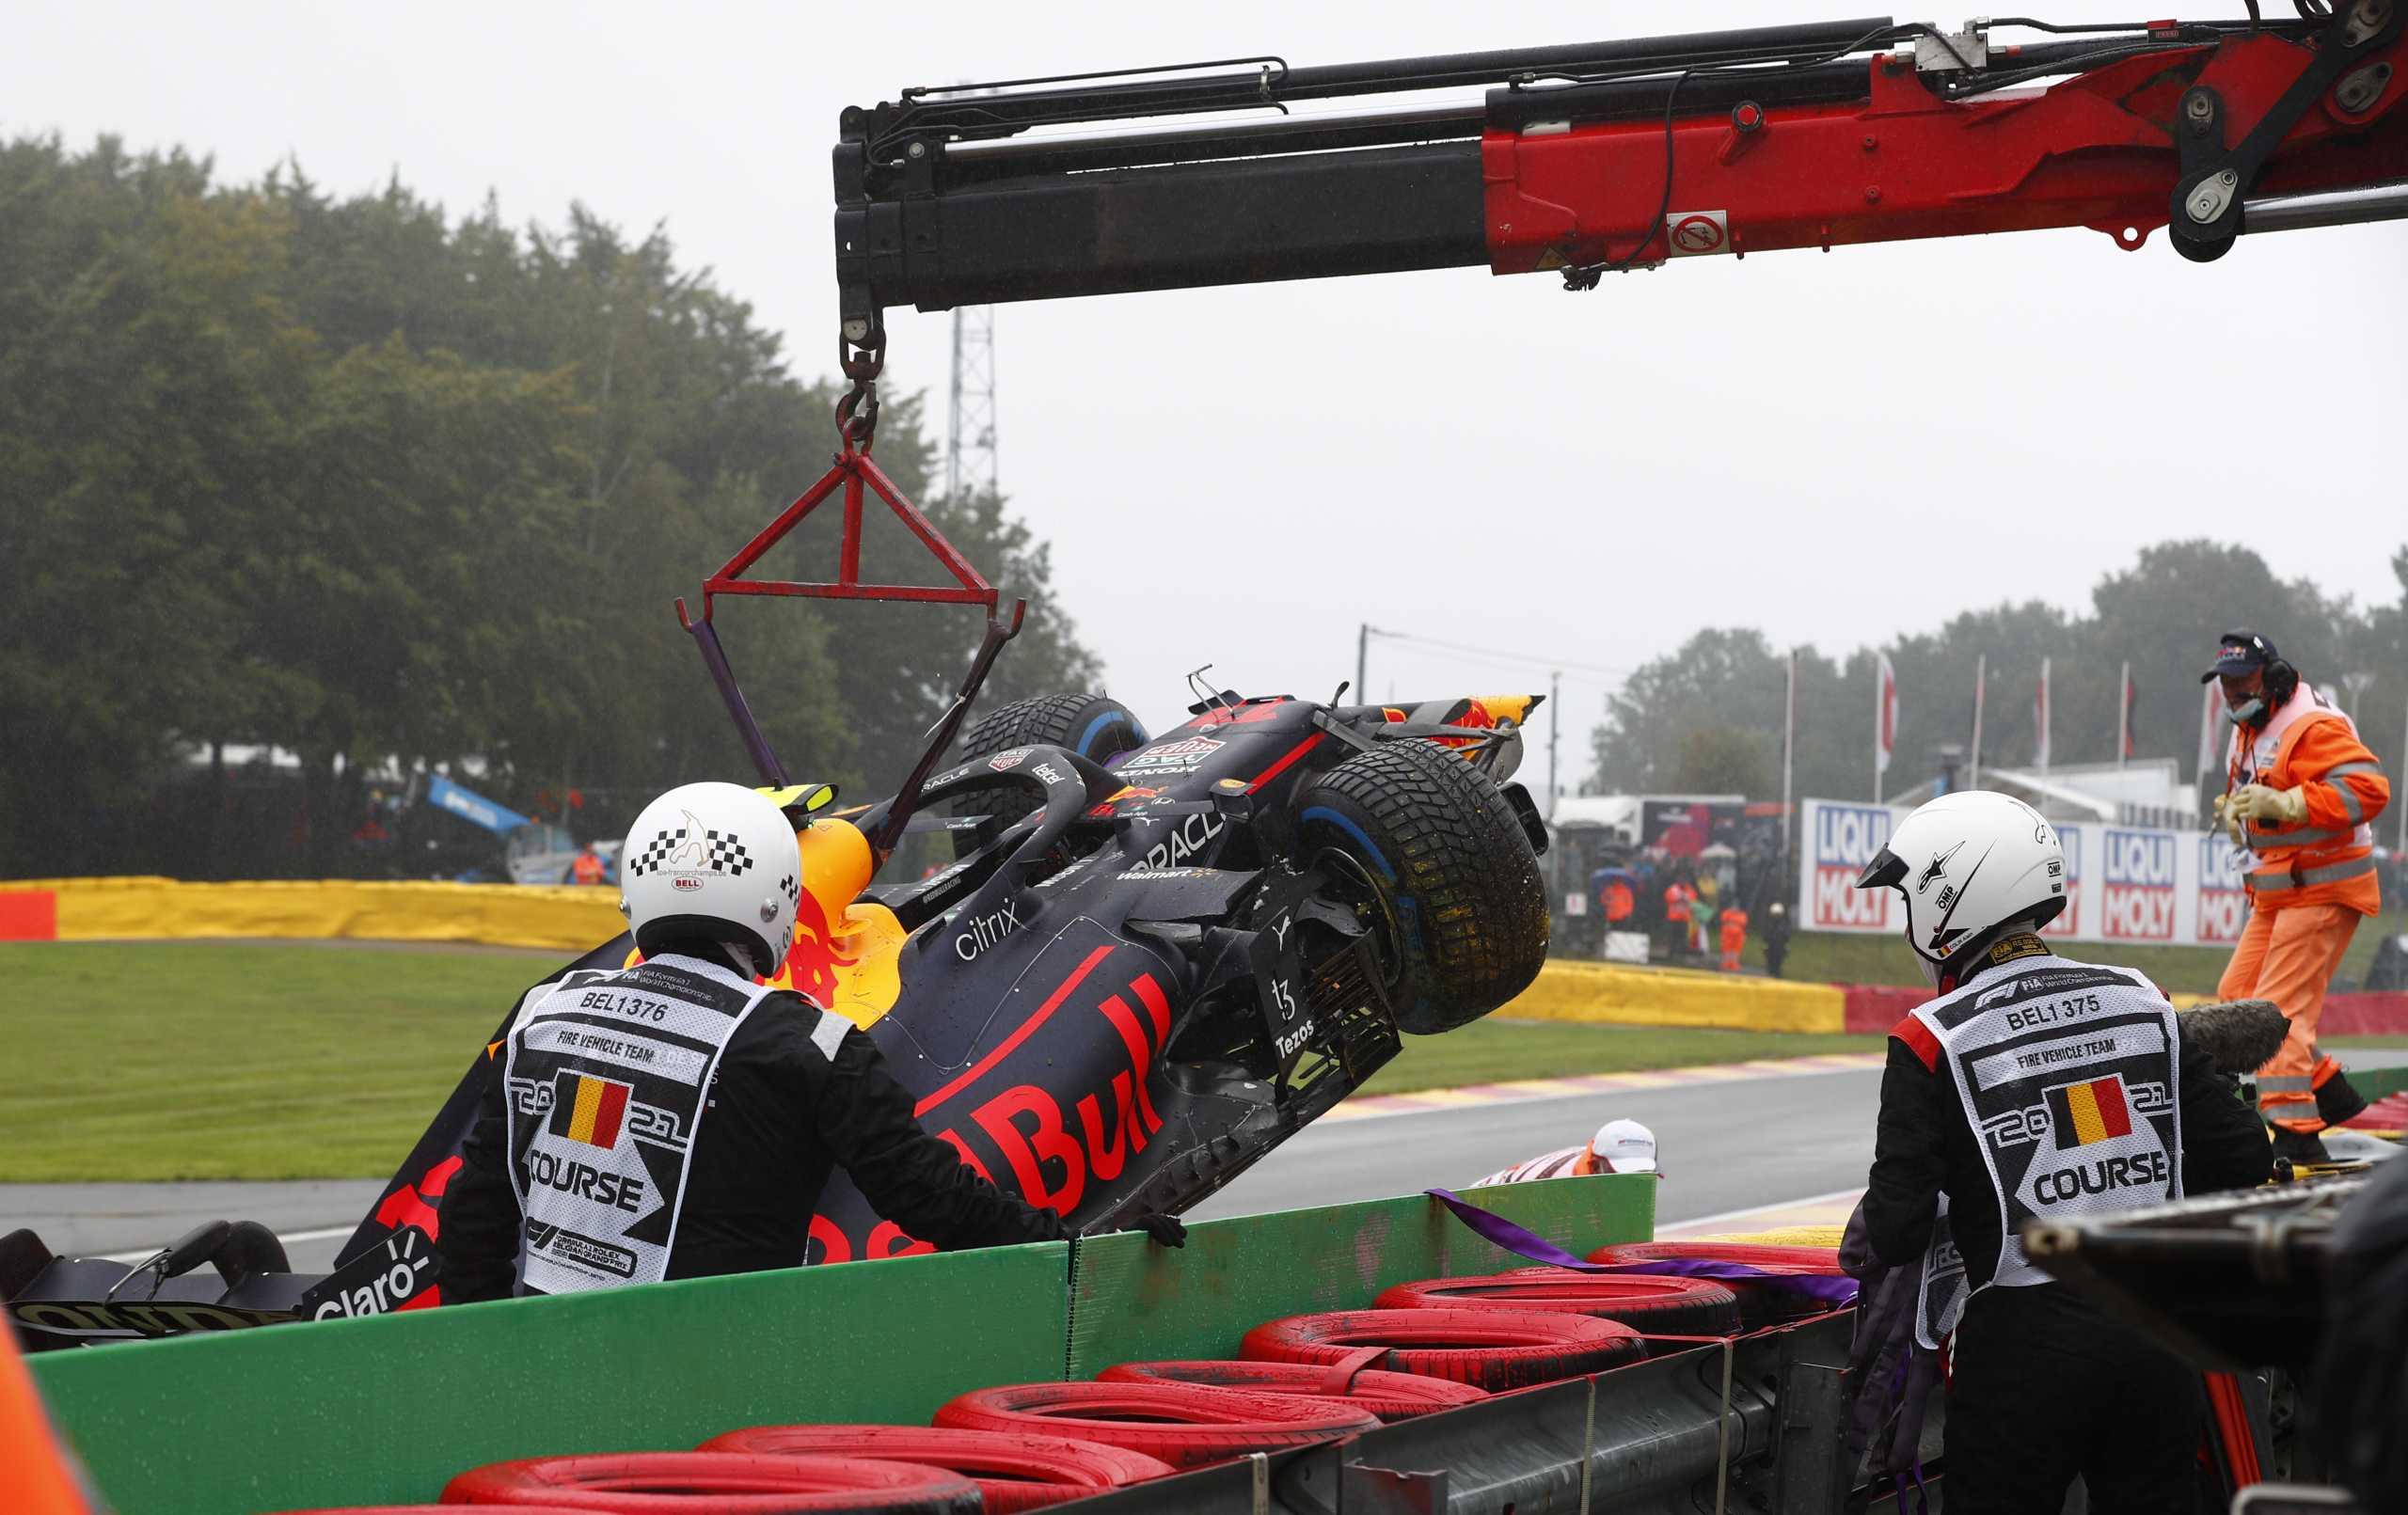 Formula 1: Ο Πέρεζ έμεινε εκτός GP Βελγίου, έχασε τον έλεγχο στον αναγνωριστικό γύρο